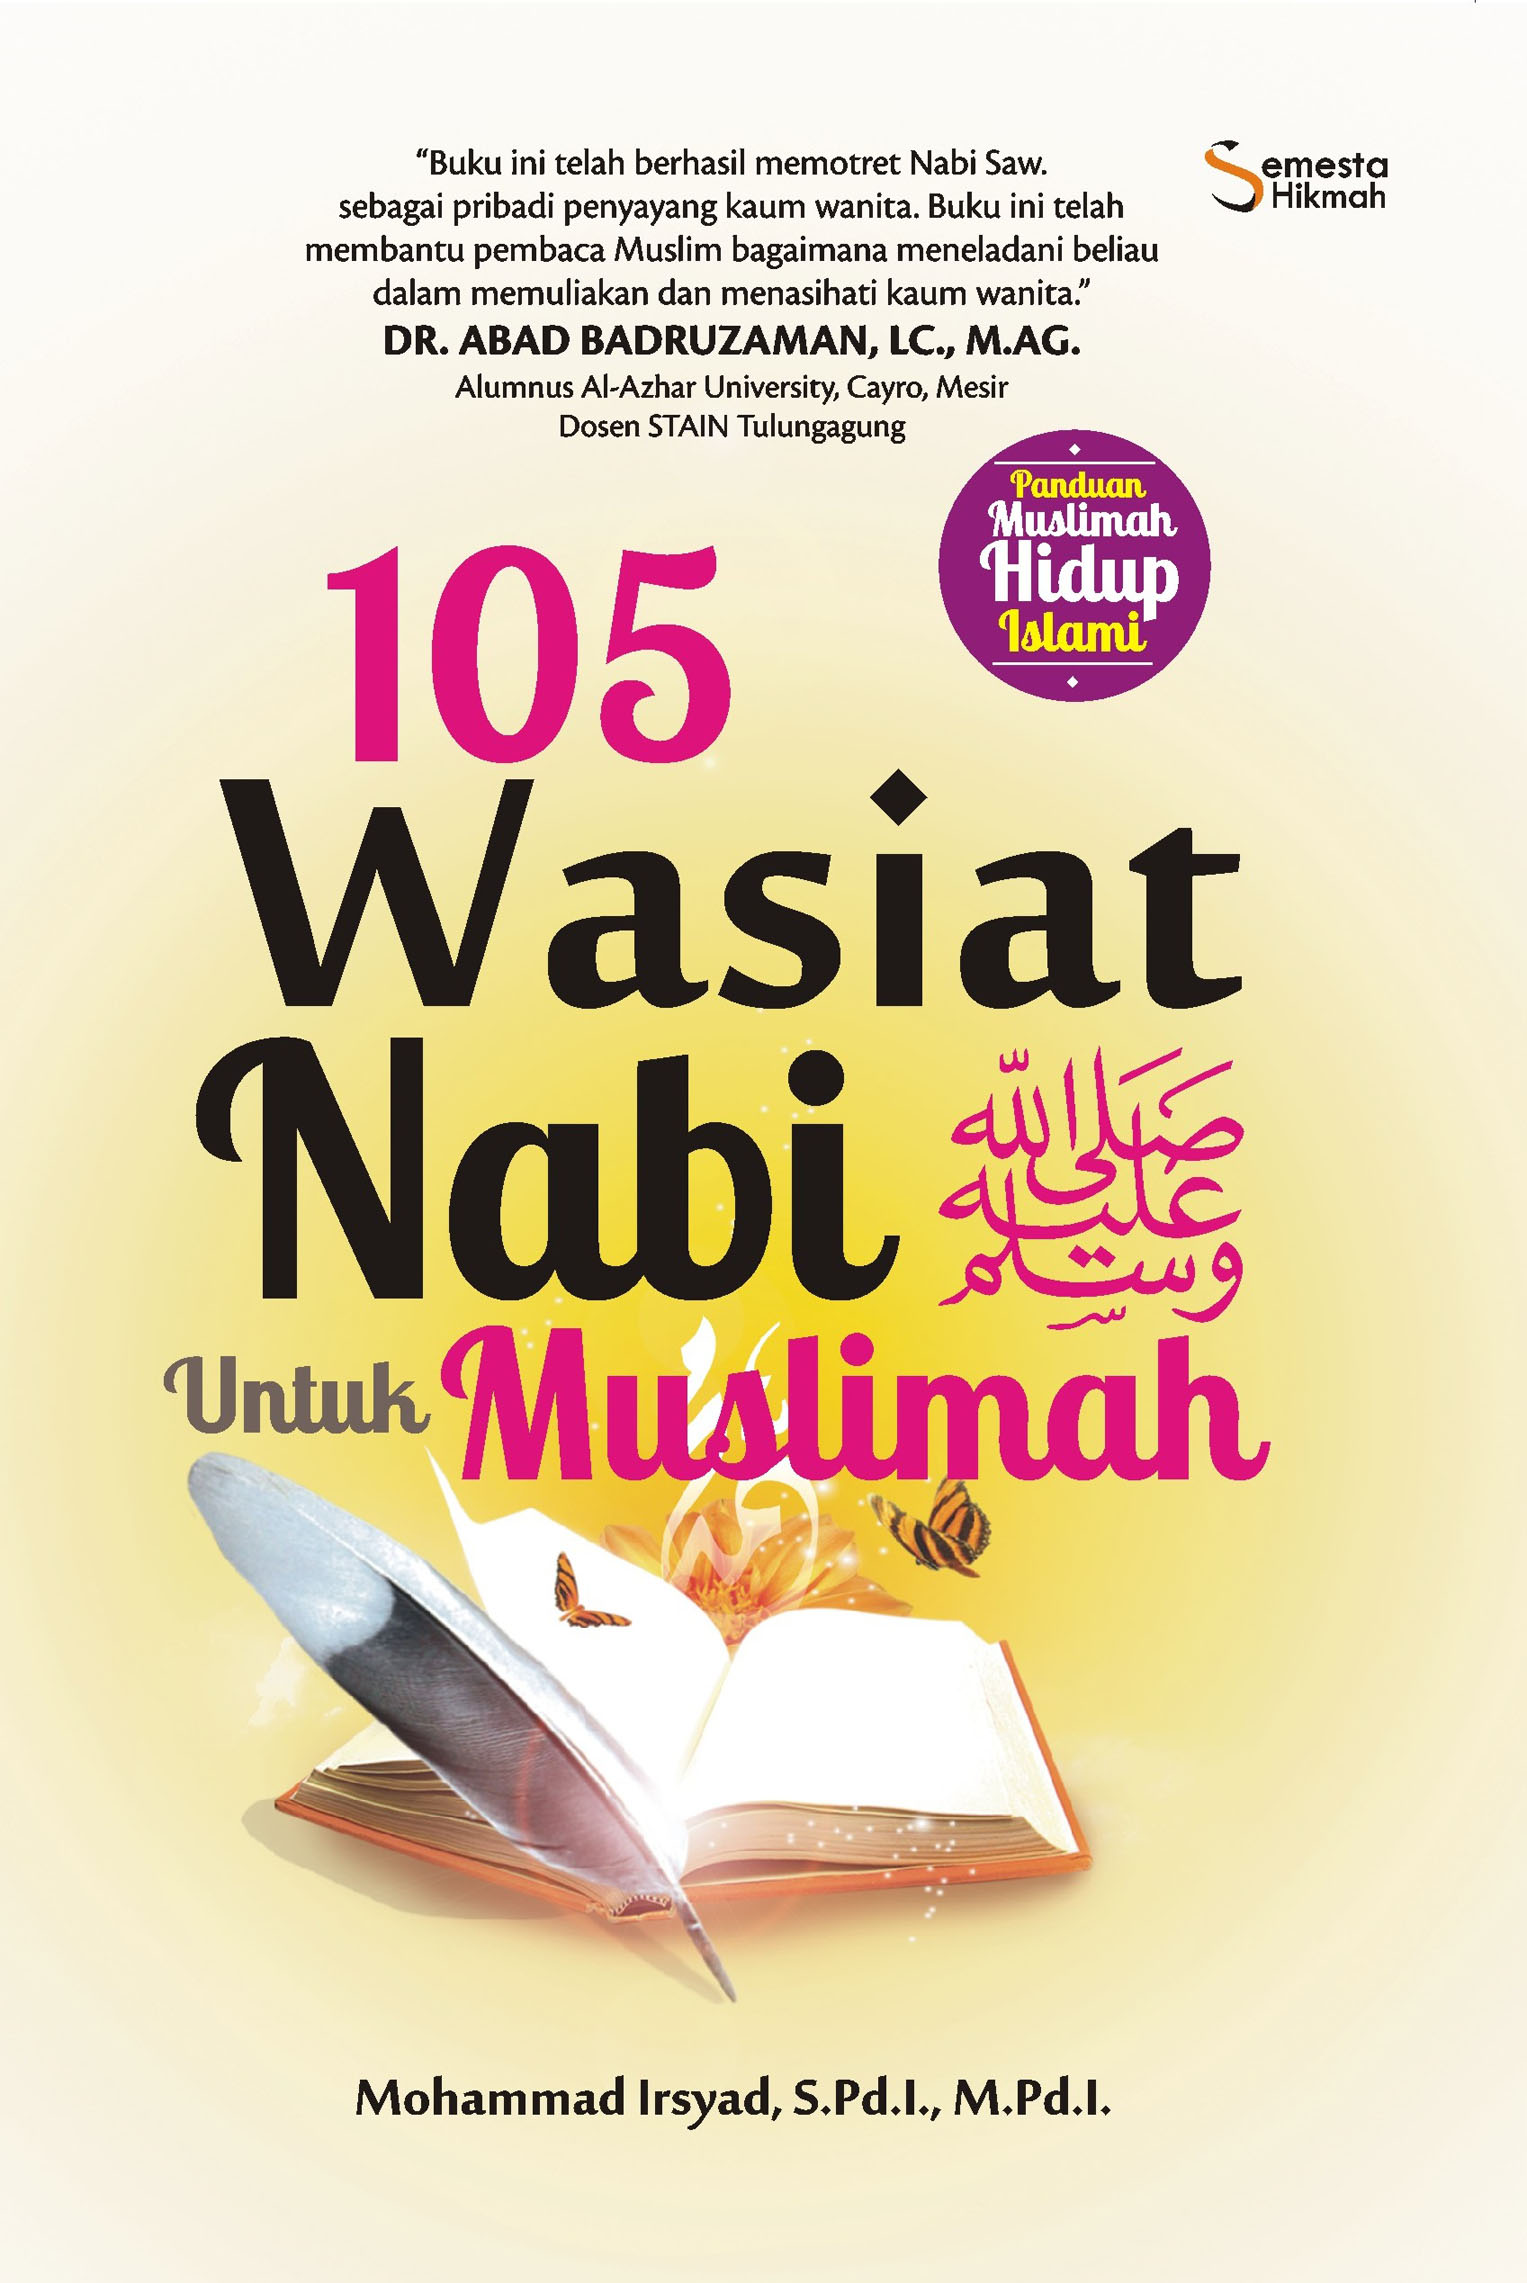 Buku 105 WASIAT NABI… - Mohammad Irsyad 8463e1ed1b